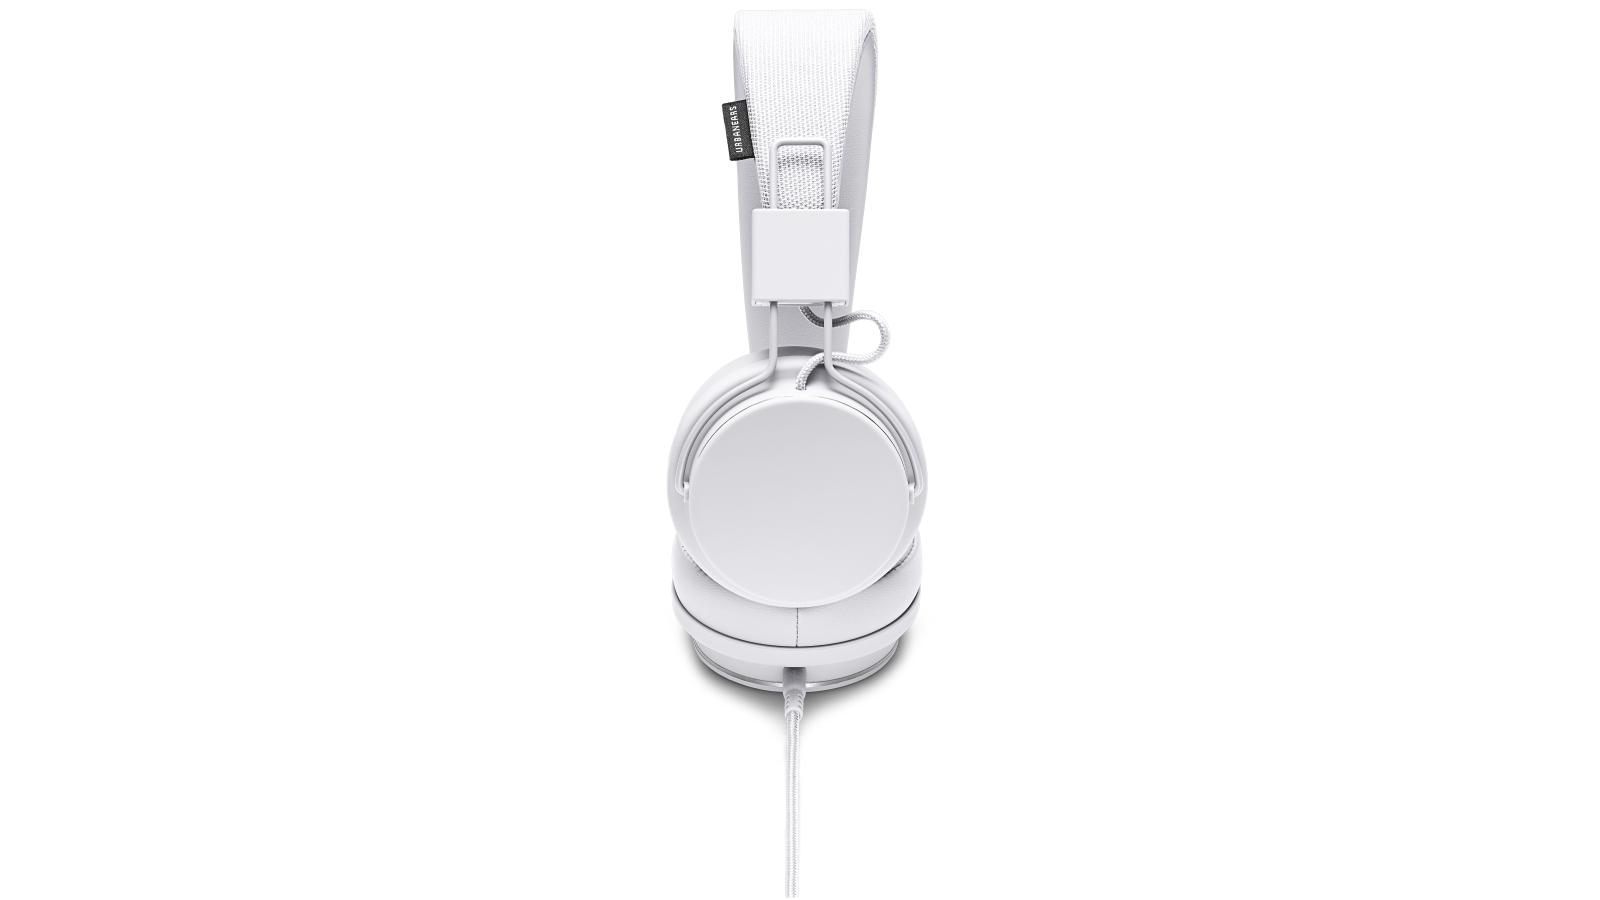 amazing price 100% authentic details for Buy Urbanears Plattan 2 On-Ear Headphones - True White   Harvey ...